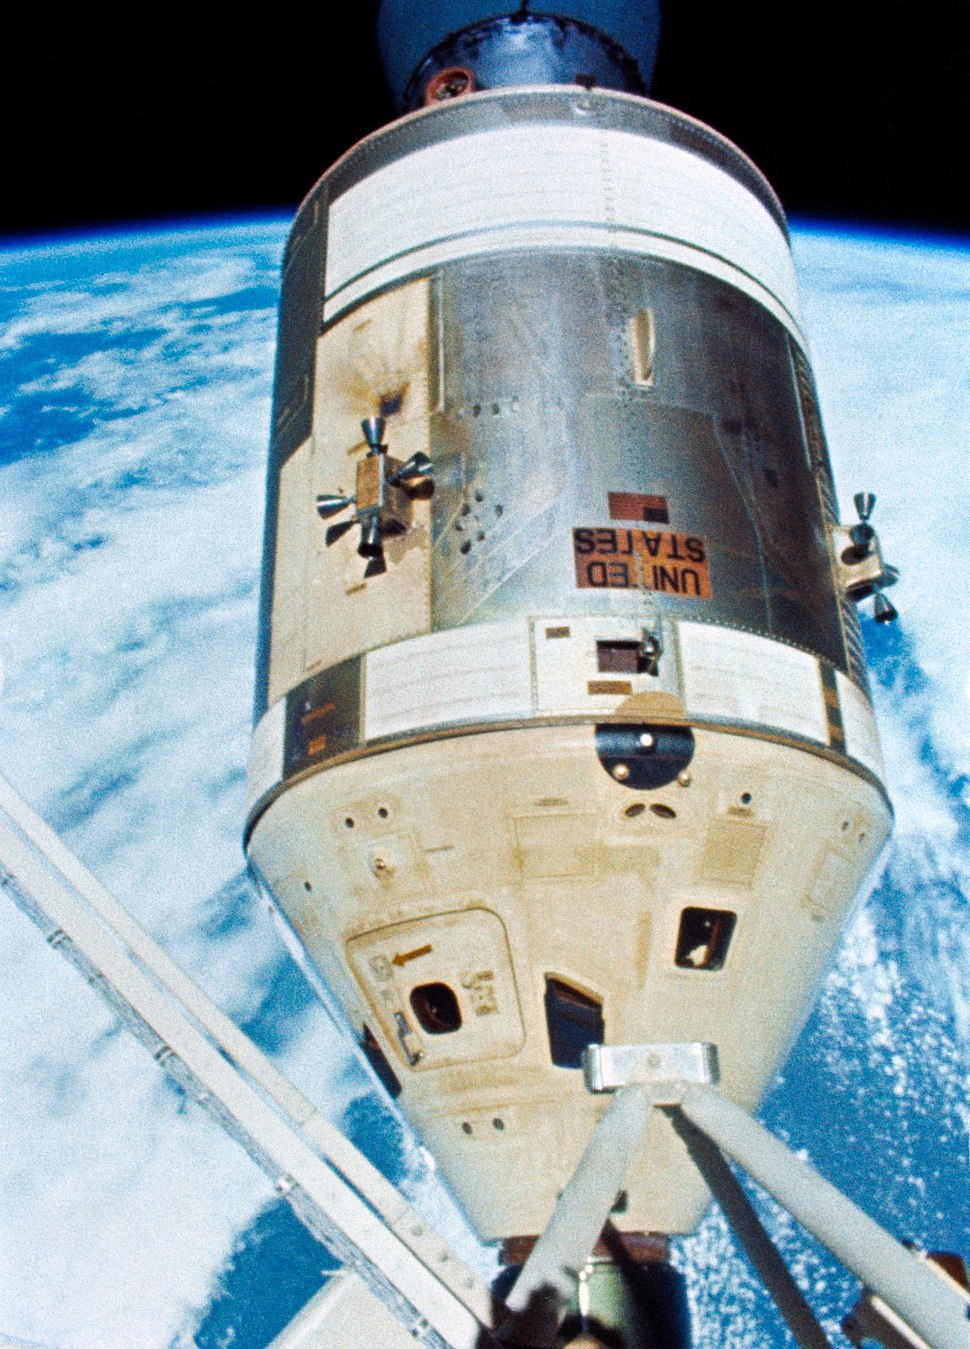 Skylab 4 - command service module